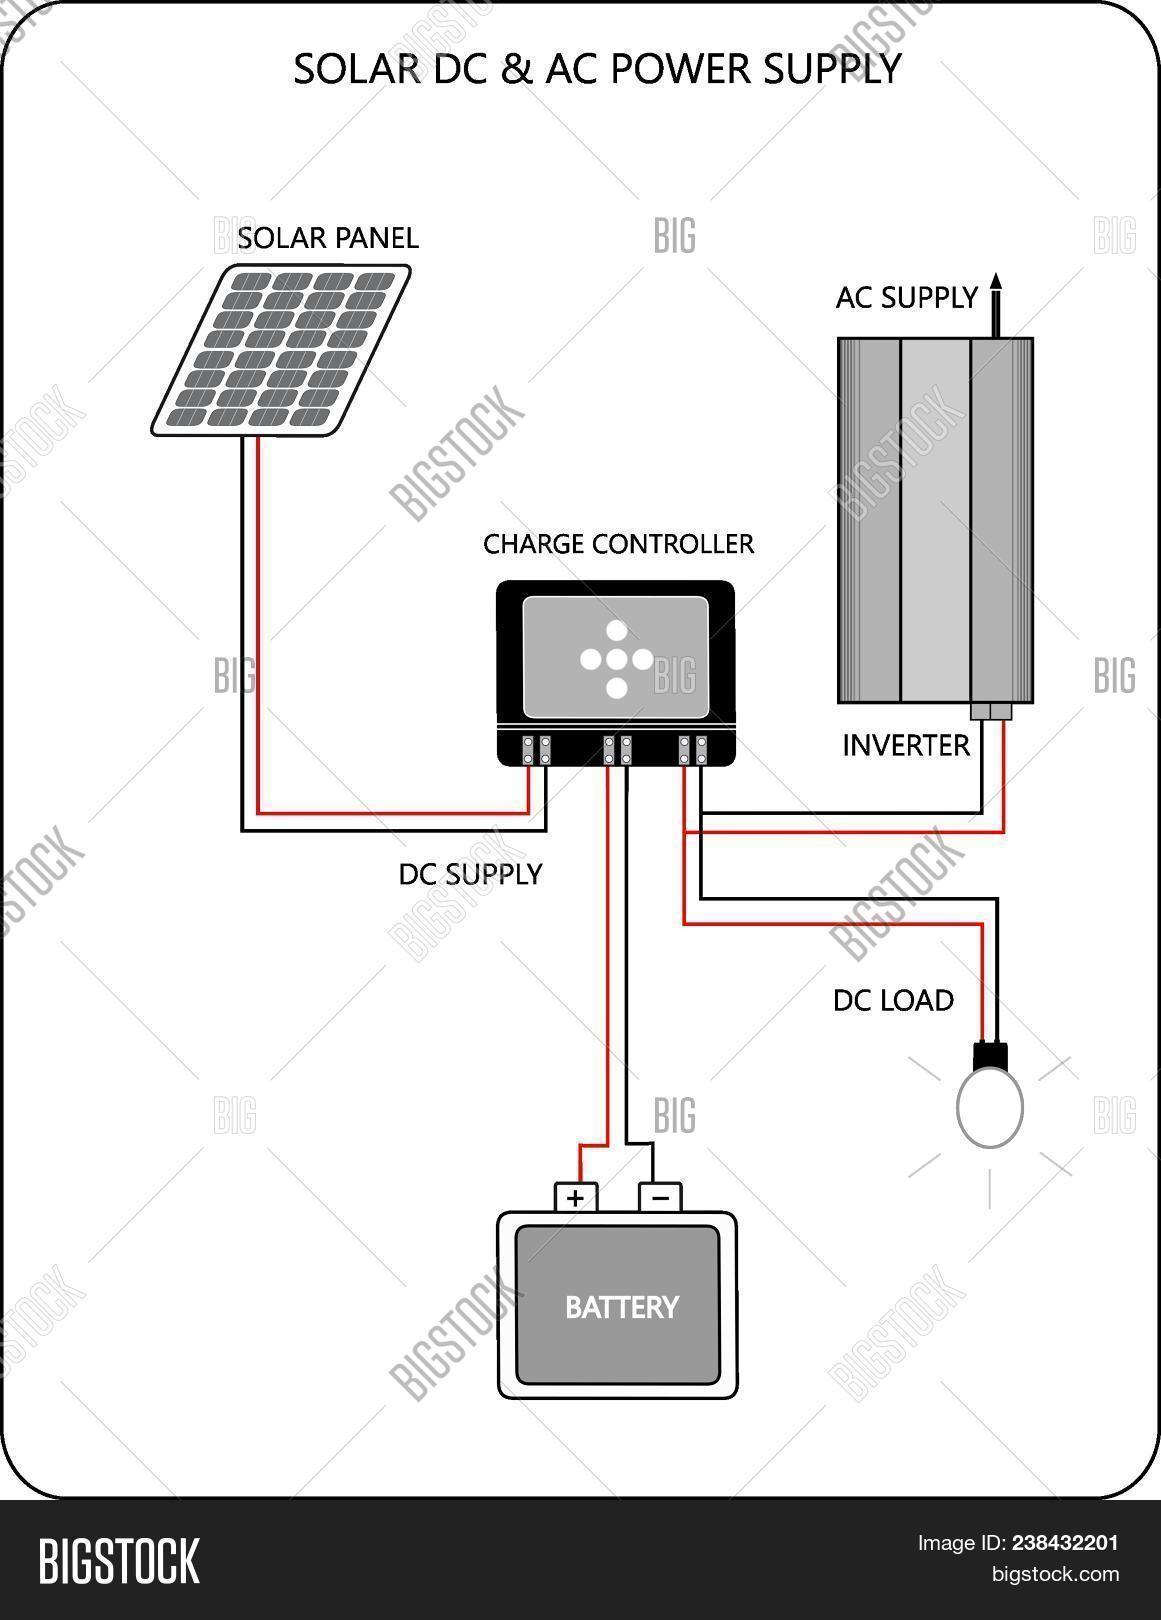 Solar Dc & Ac Power Image & Photo (Free Trial) | Bigstock on